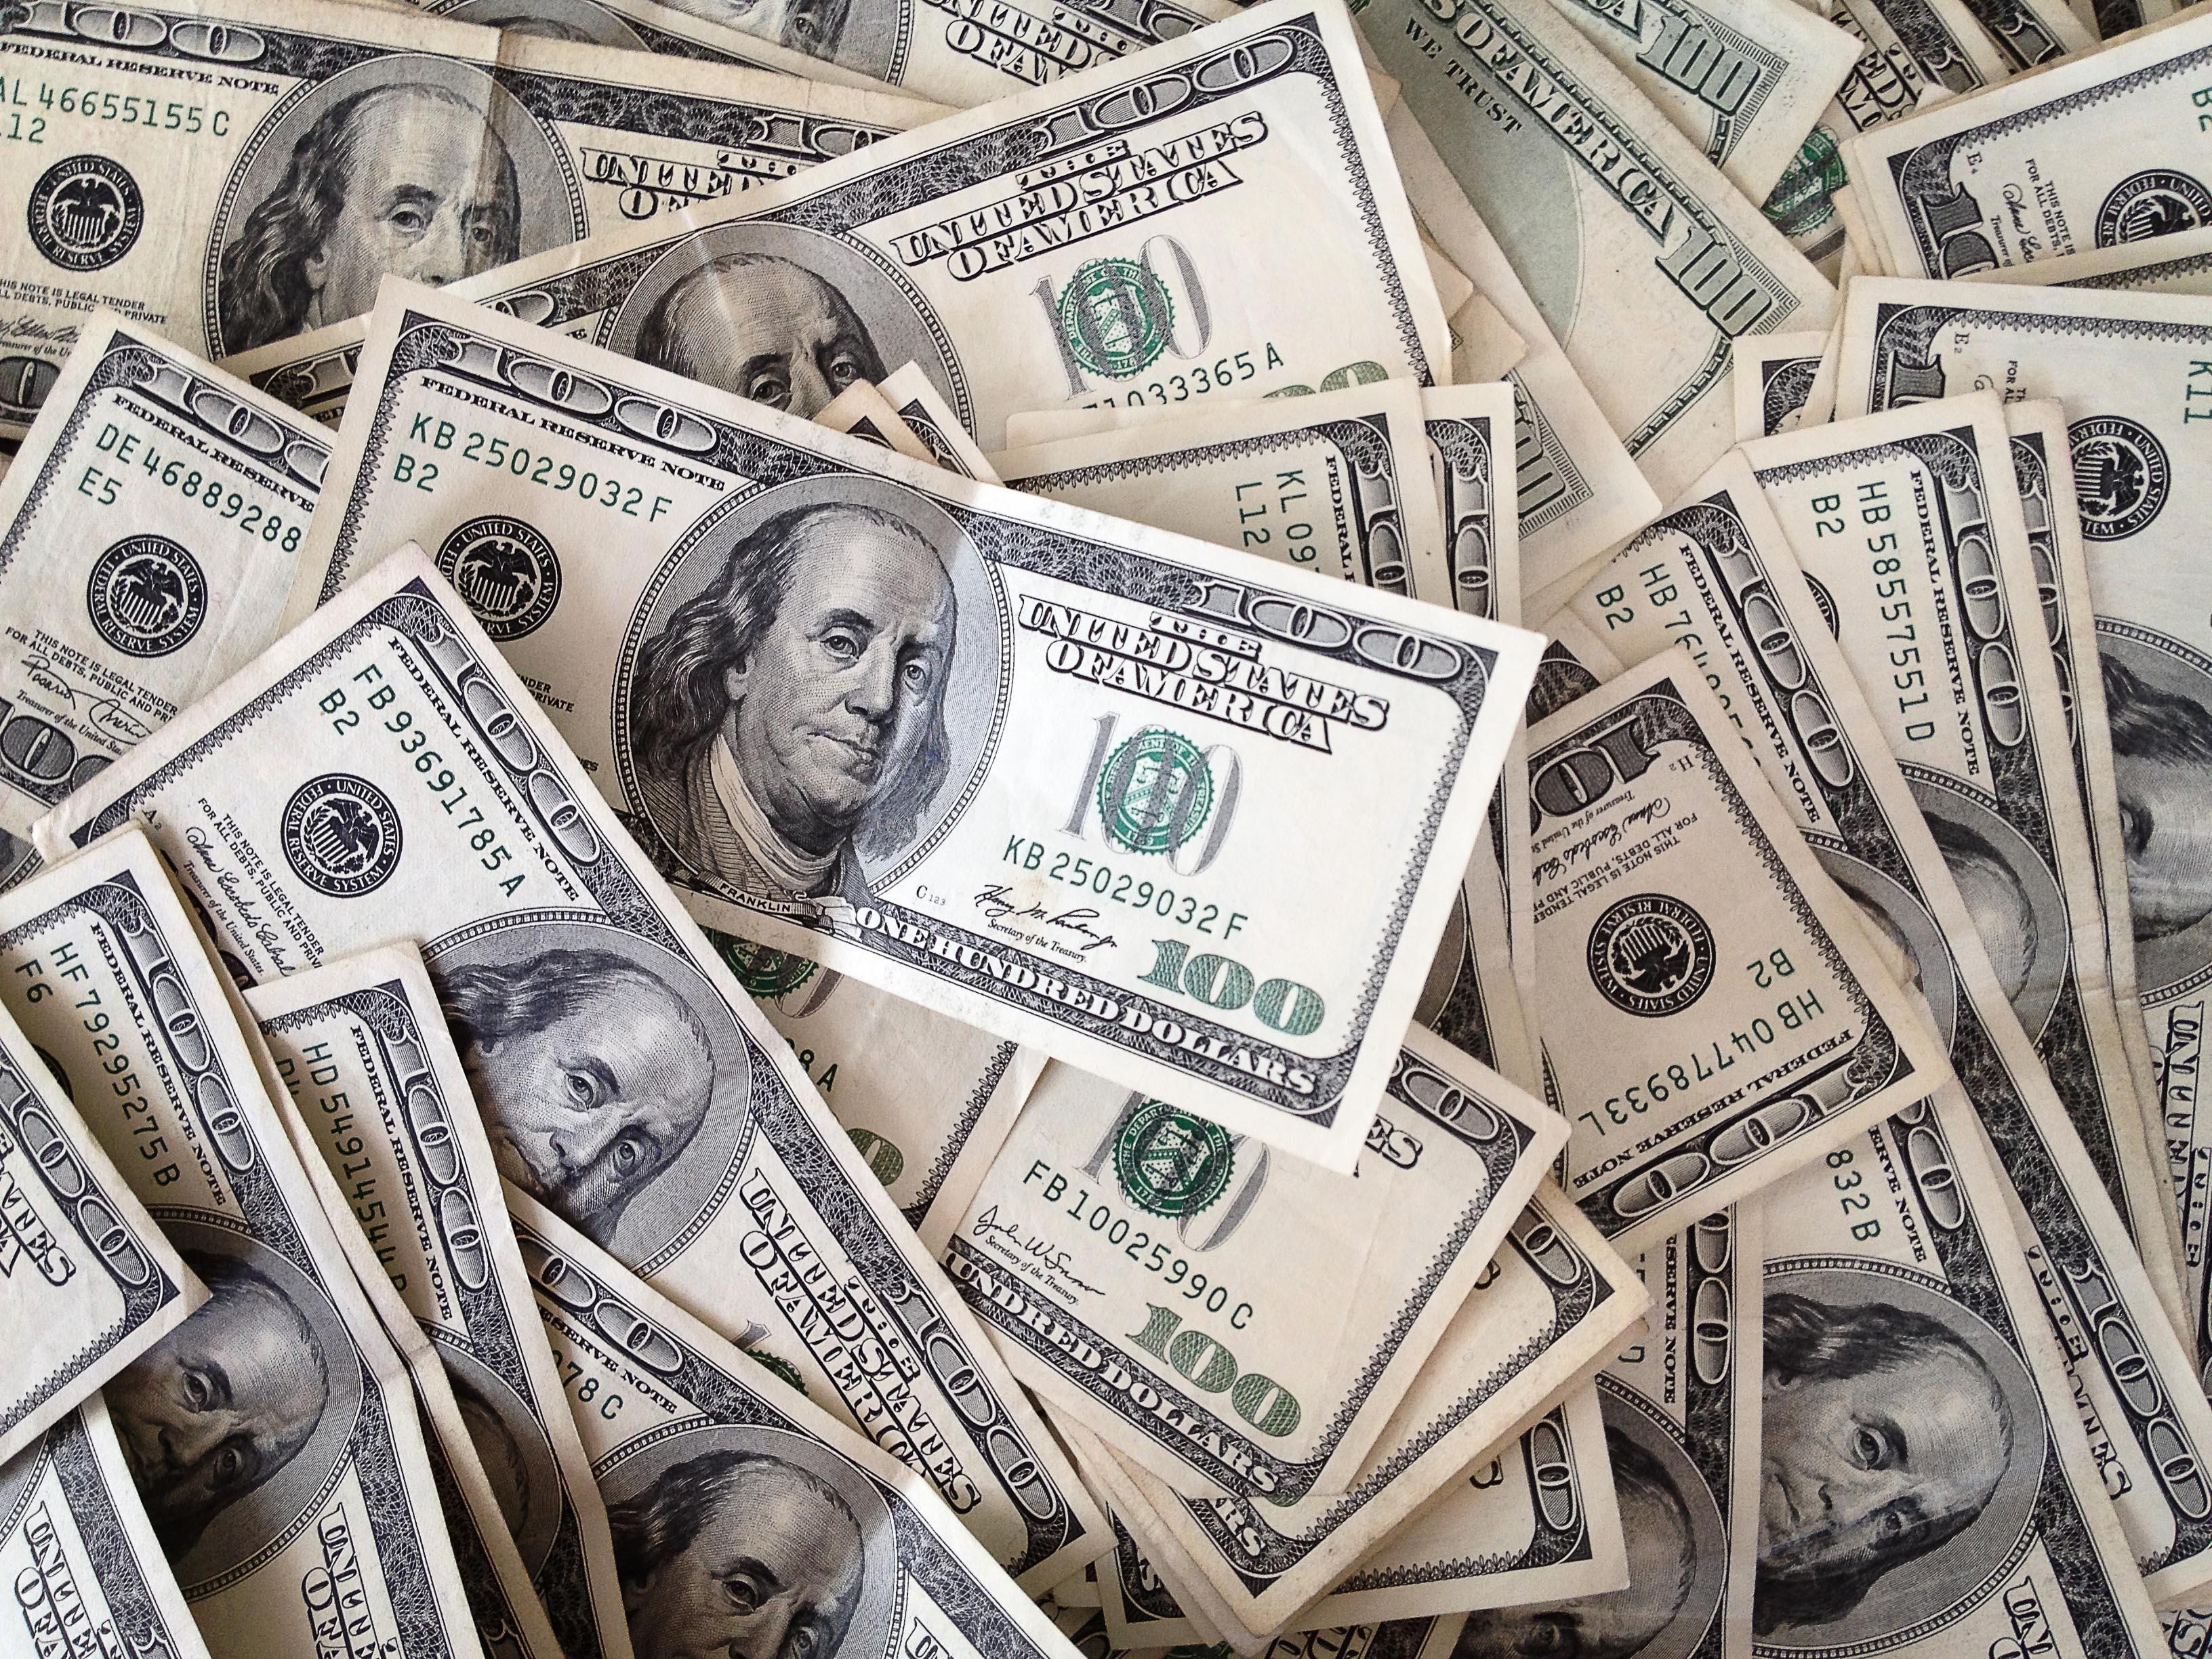 Pile Of 100 Dollar Bills 3264x2448